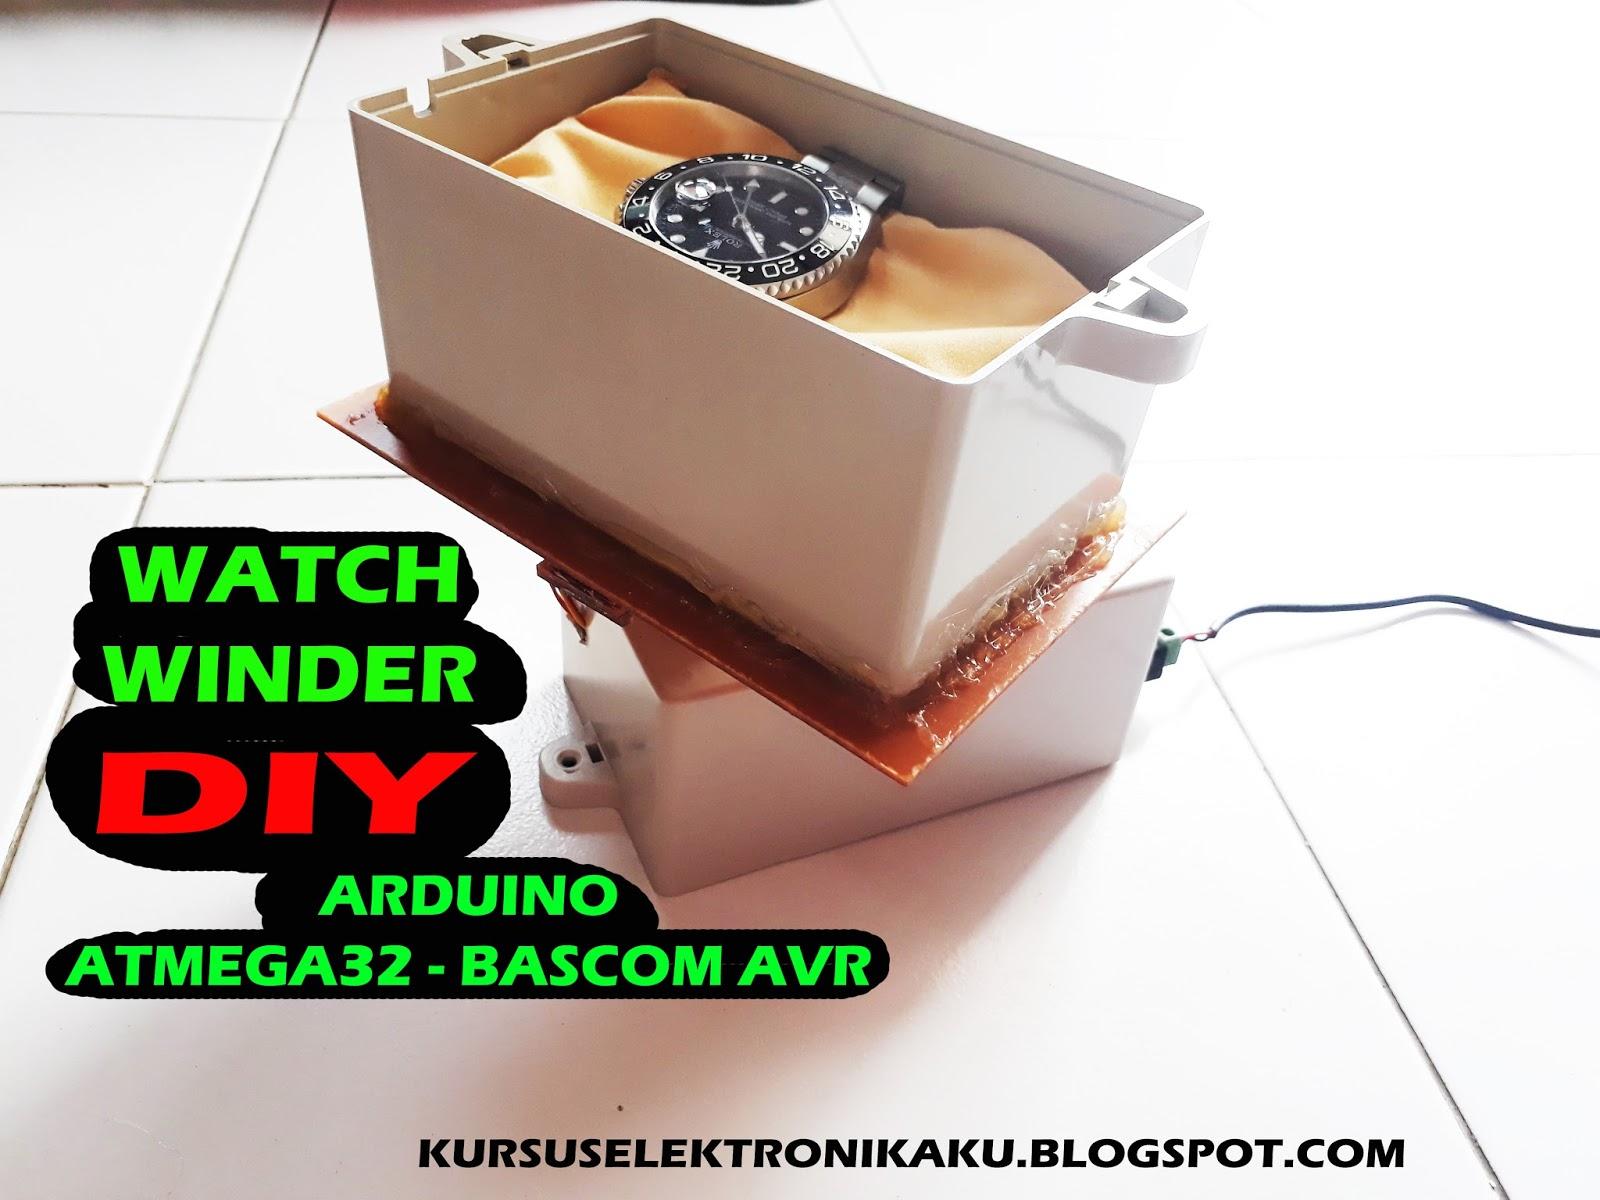 Membuat watch winder automatics pemutar jam tangan